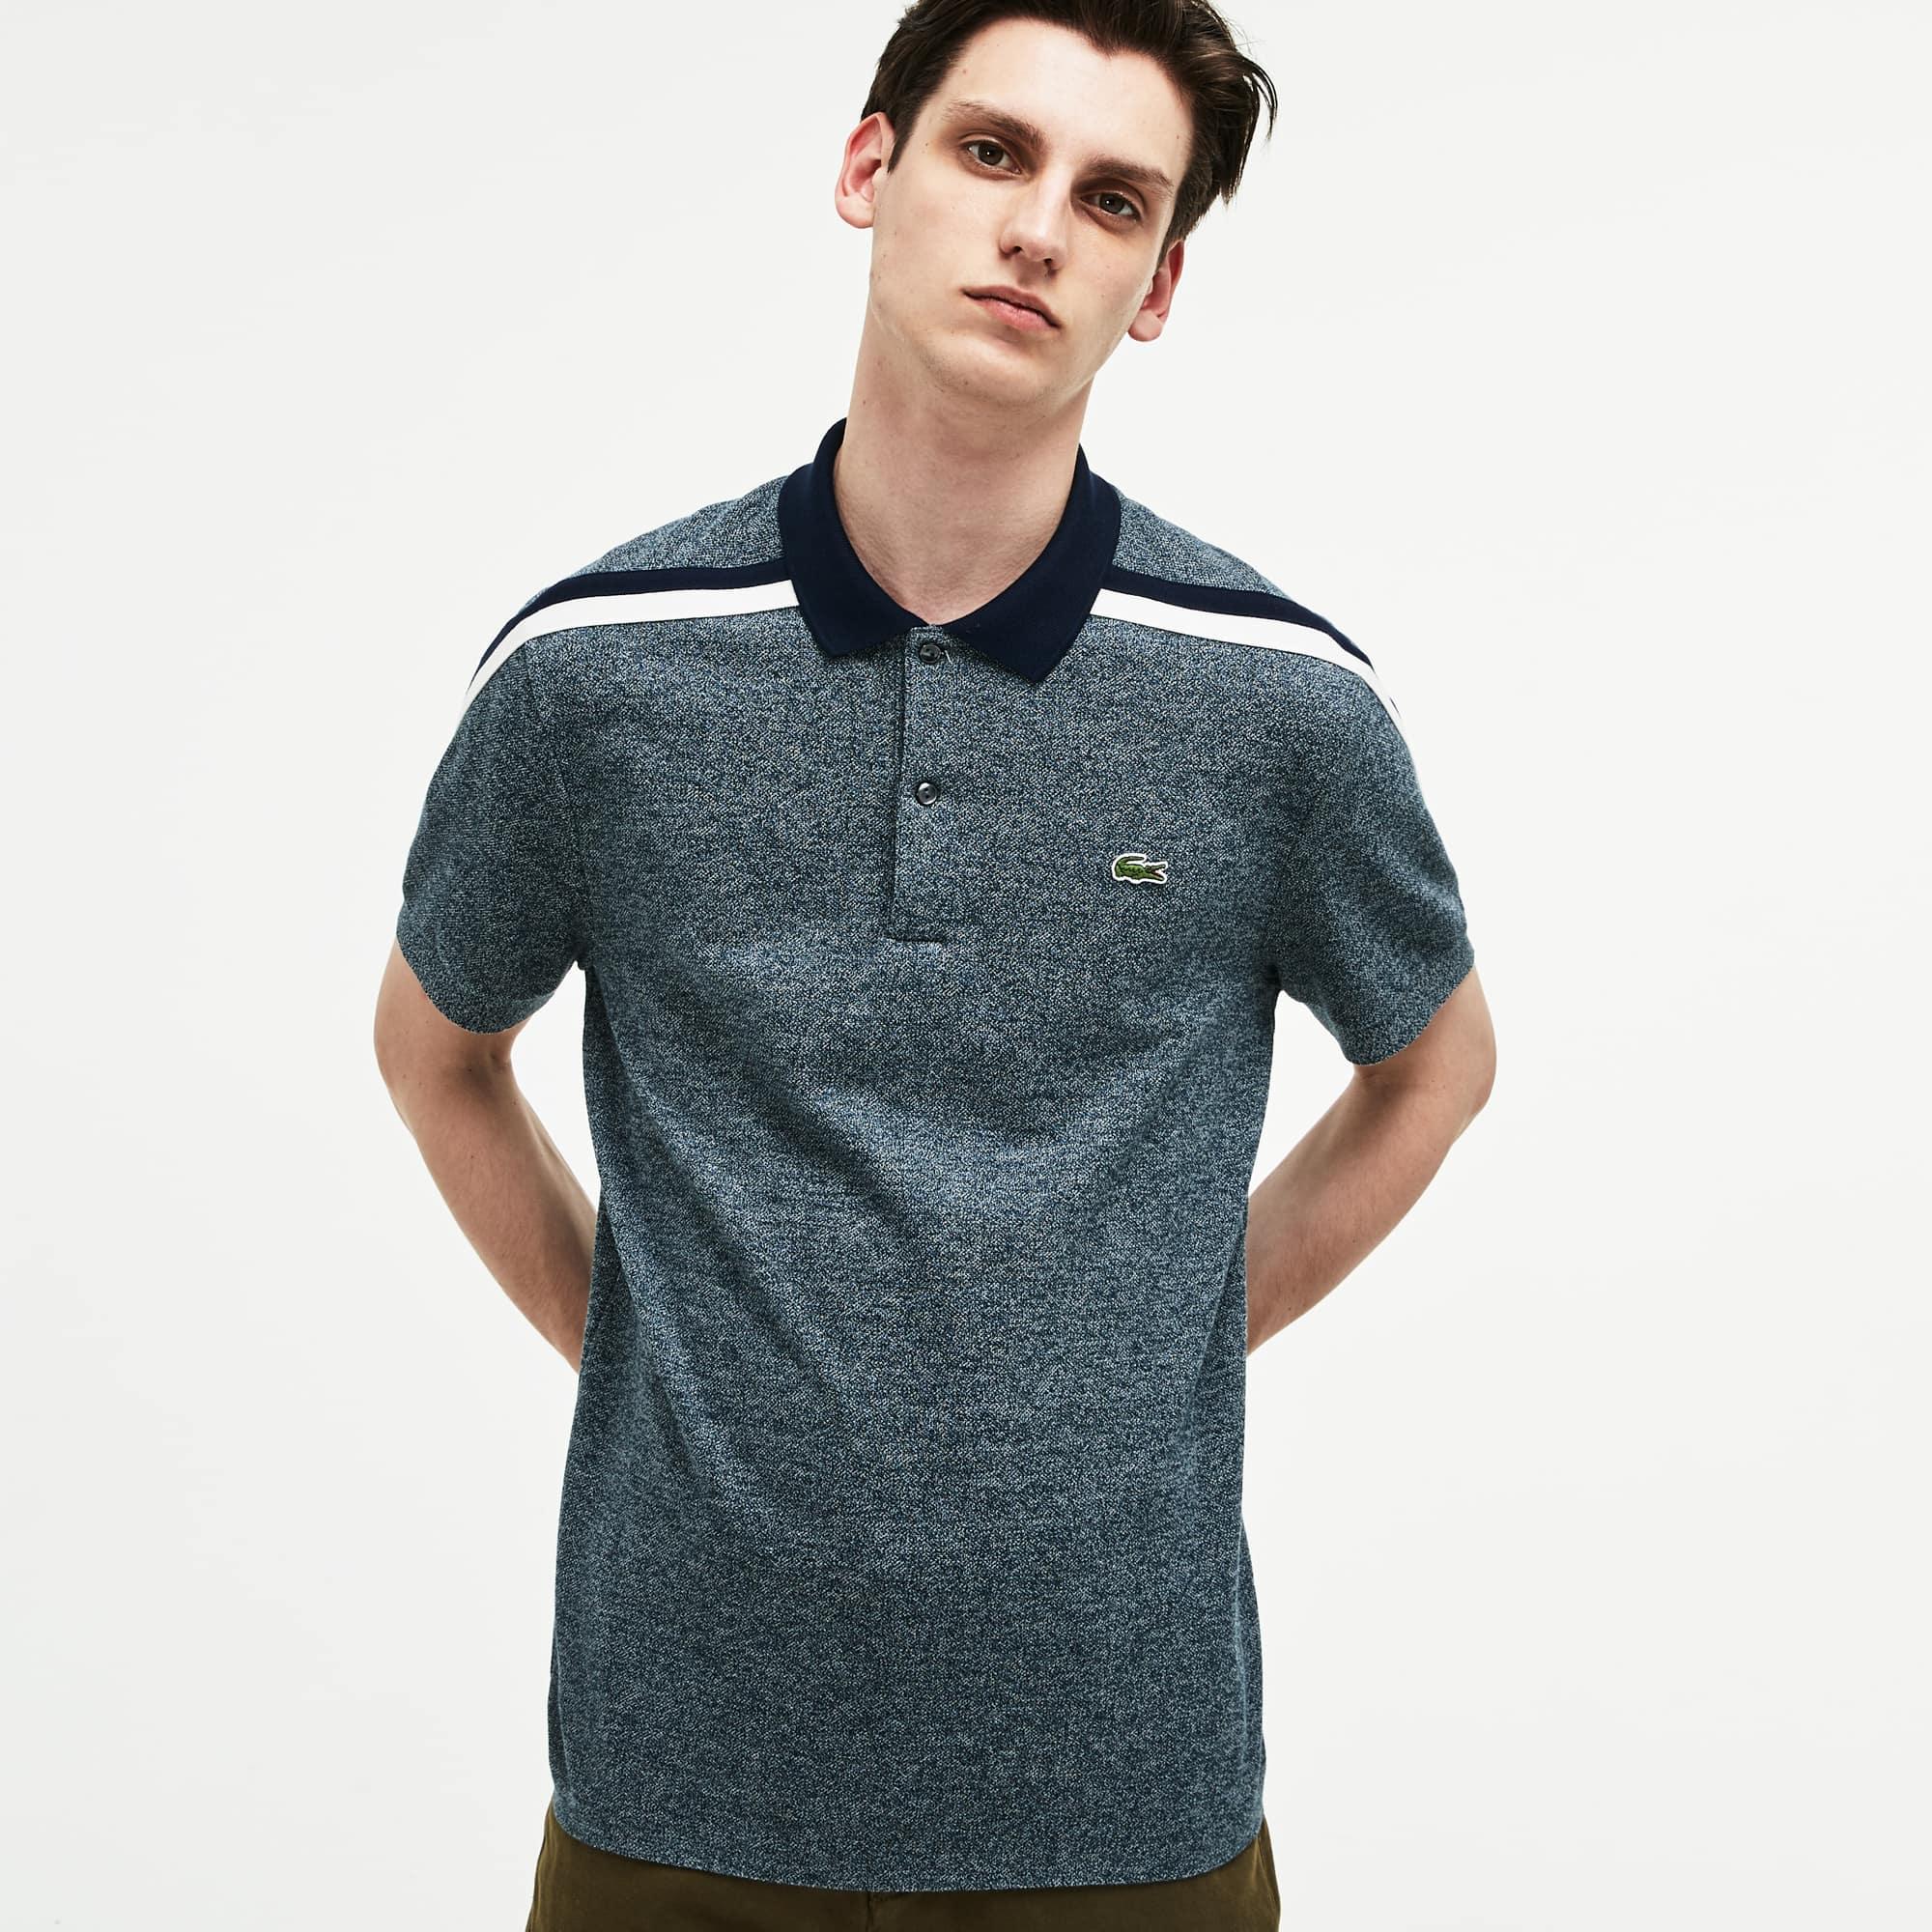 Lacoste - LACOSTE Made In France Regular Fit Herren-Poloshirt aus Baumwoll-Piqué - 5